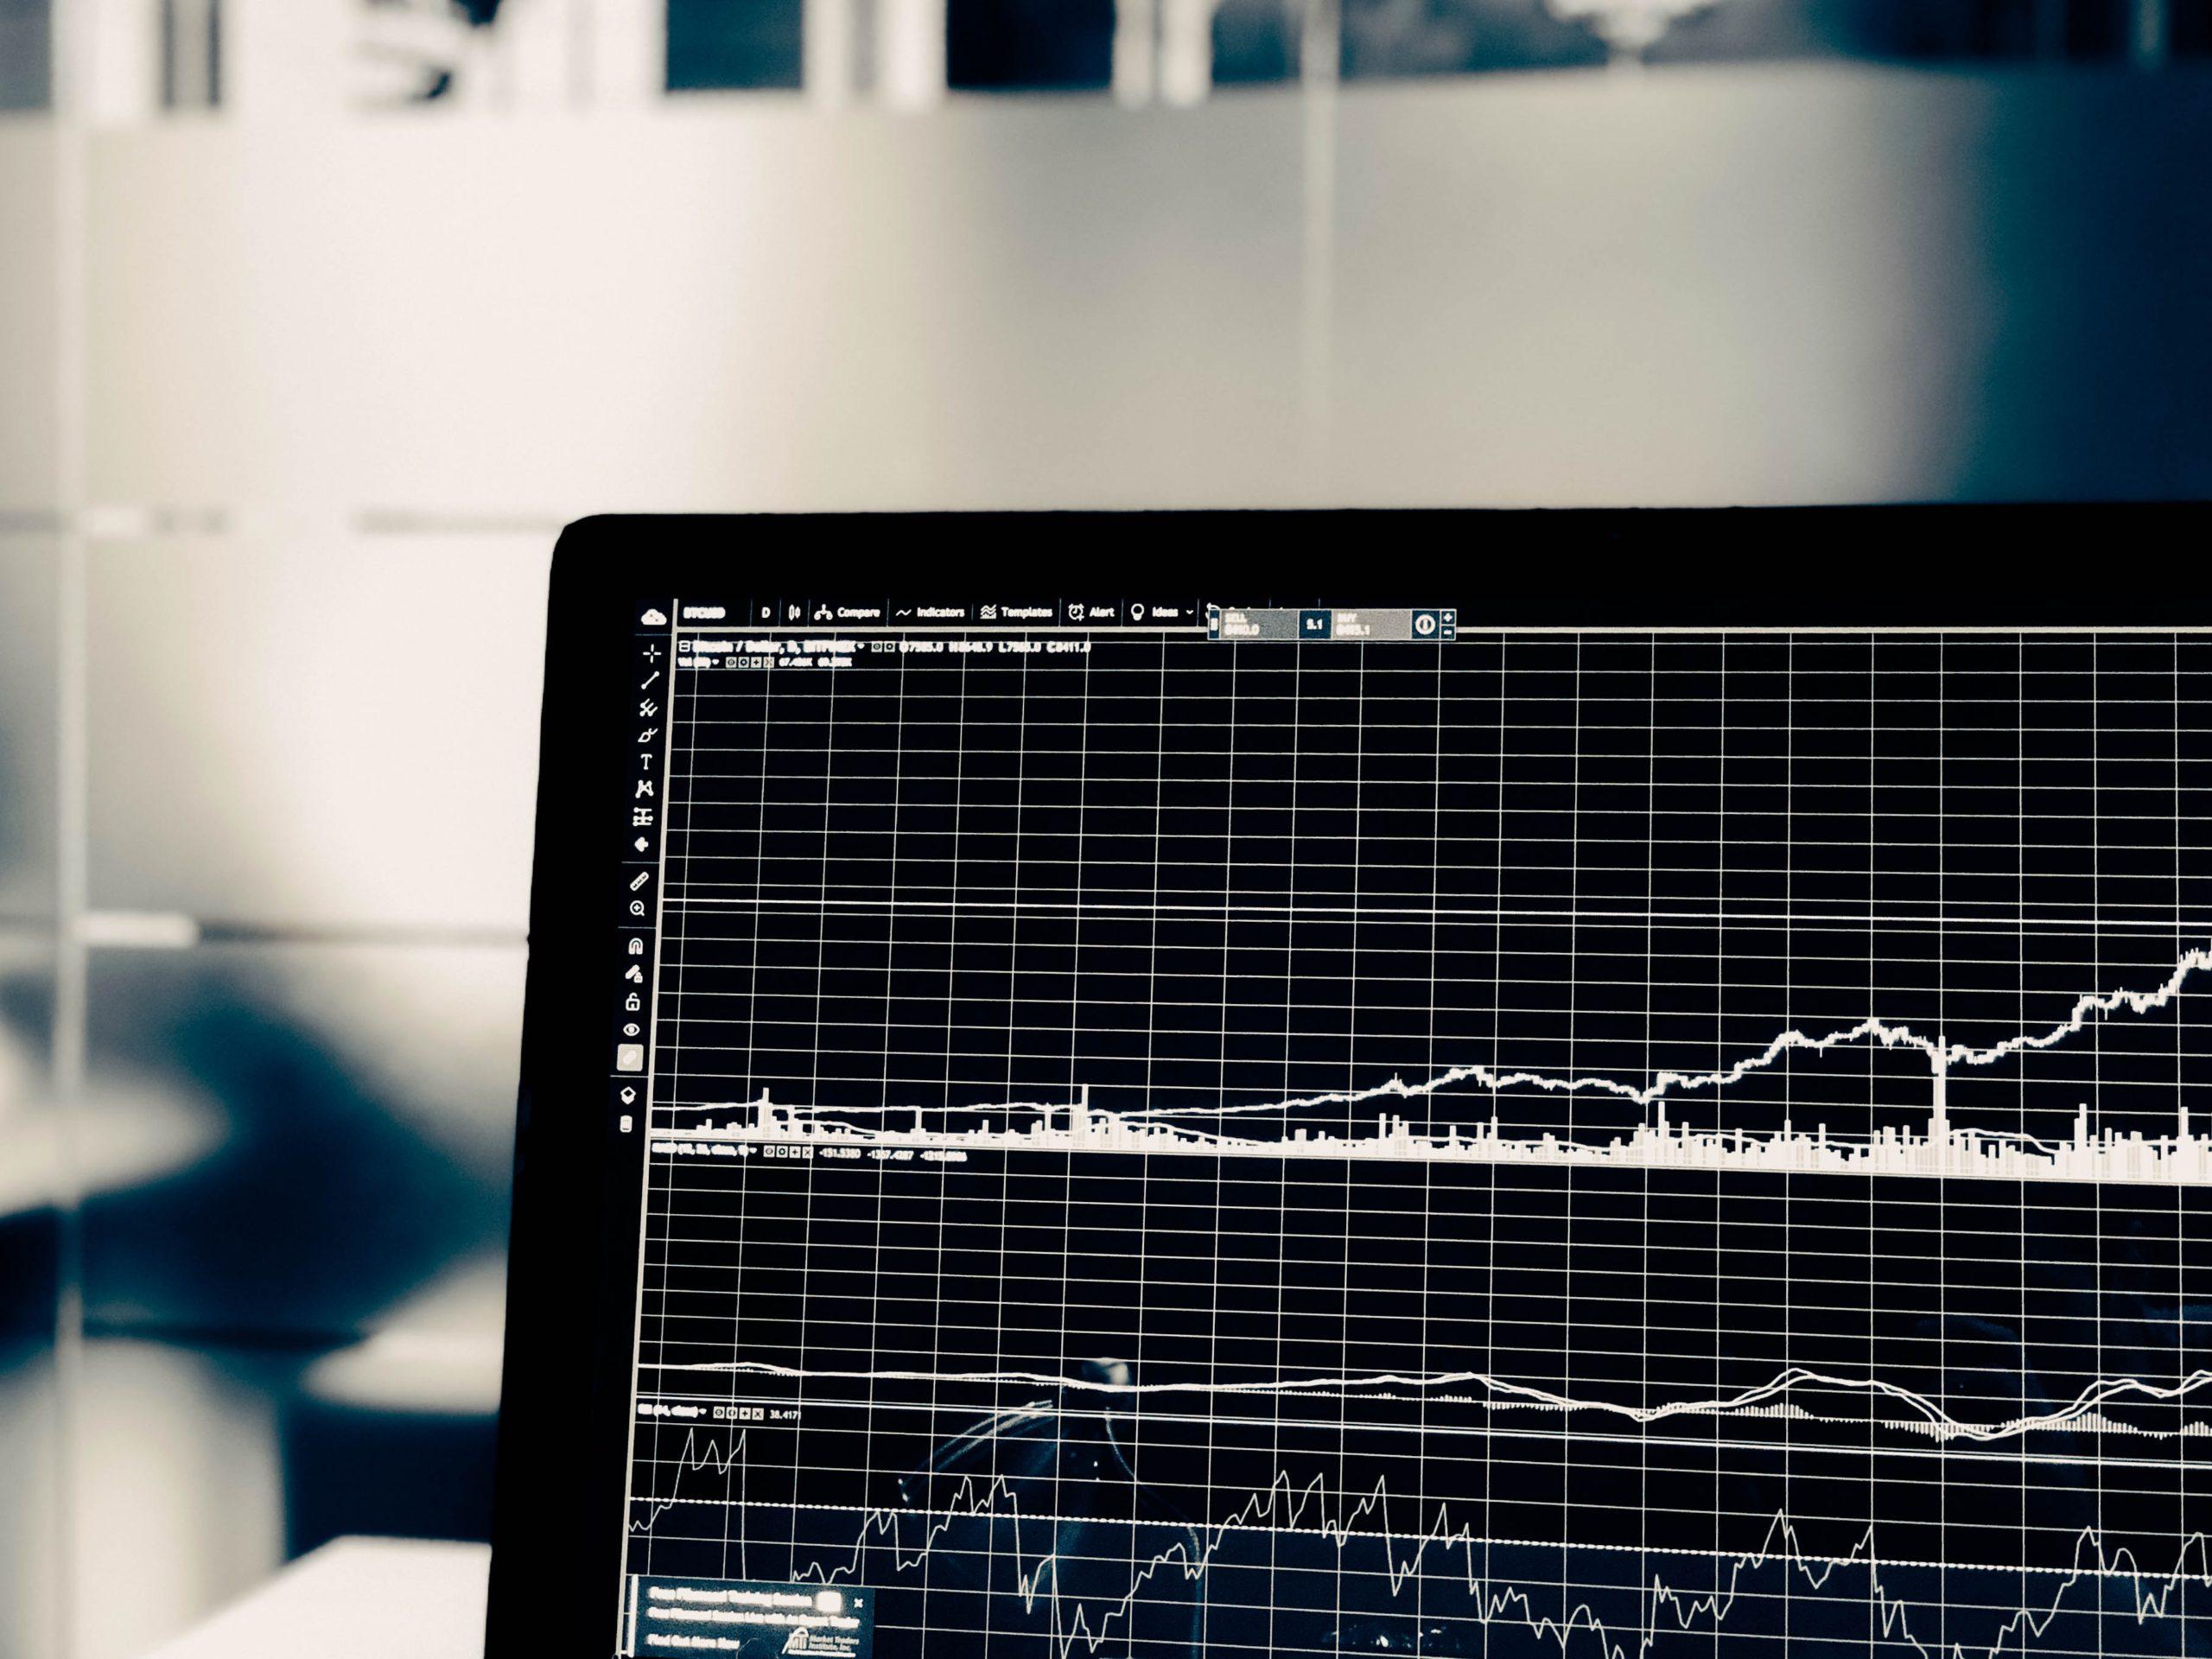 Análise de dados: o que mudou desde os anos 2000?